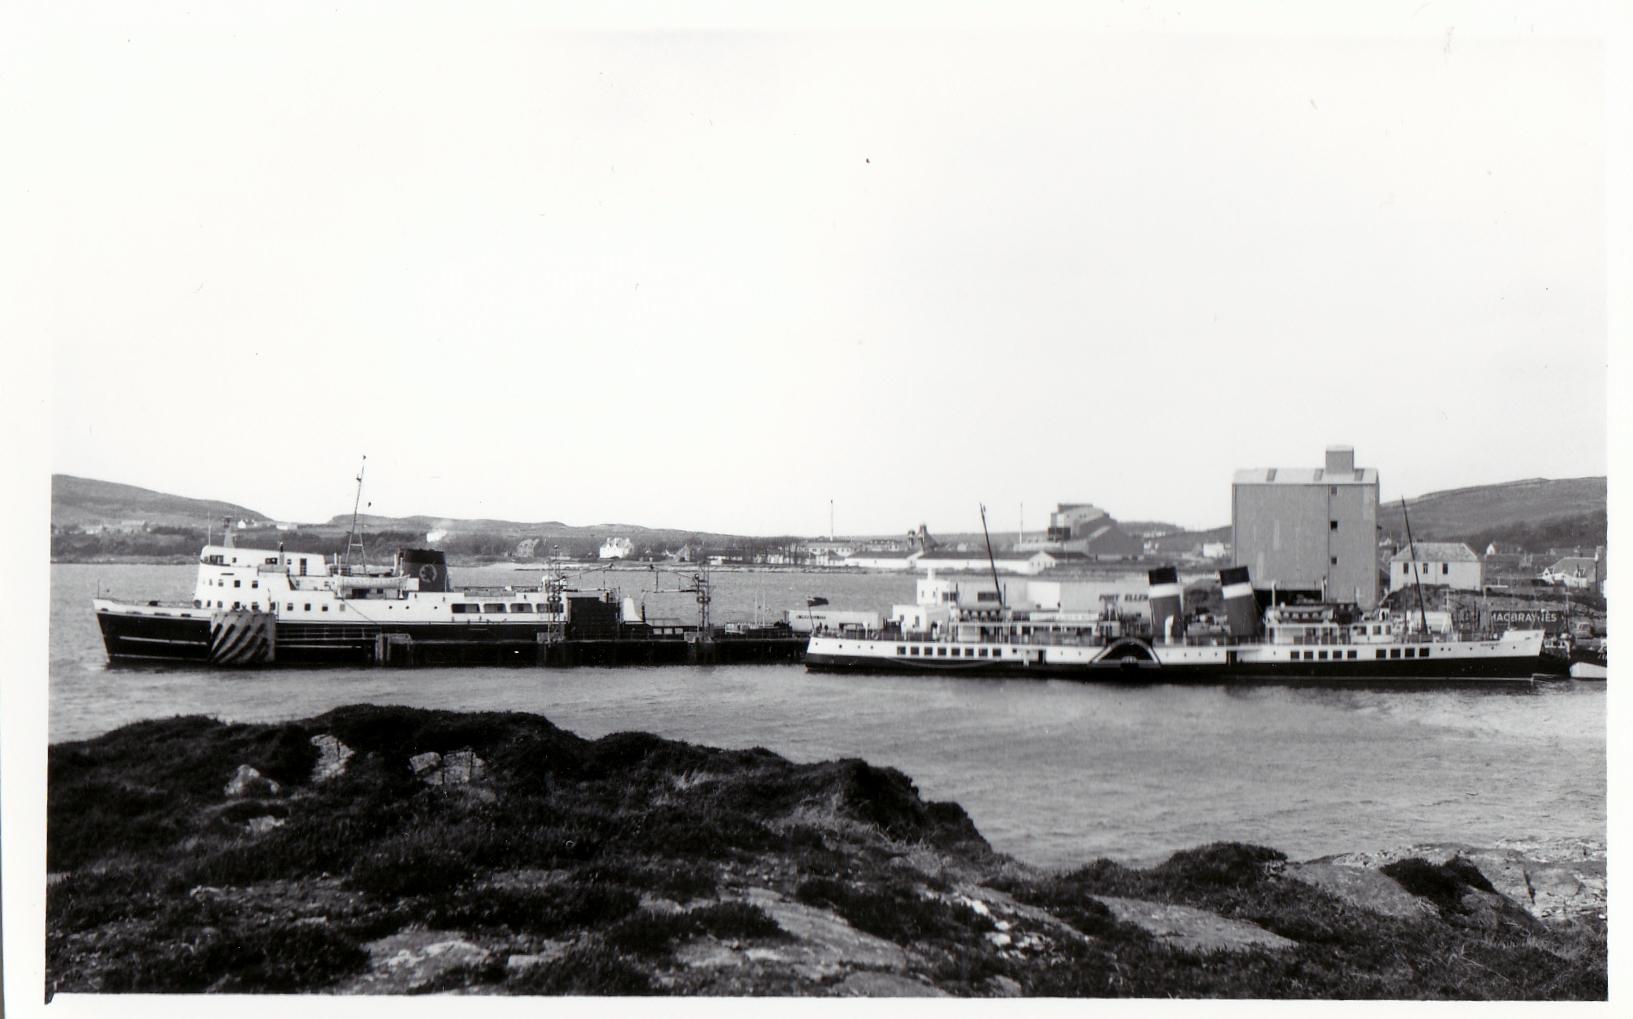 Waverley and Glen Sannox at Port Ellen